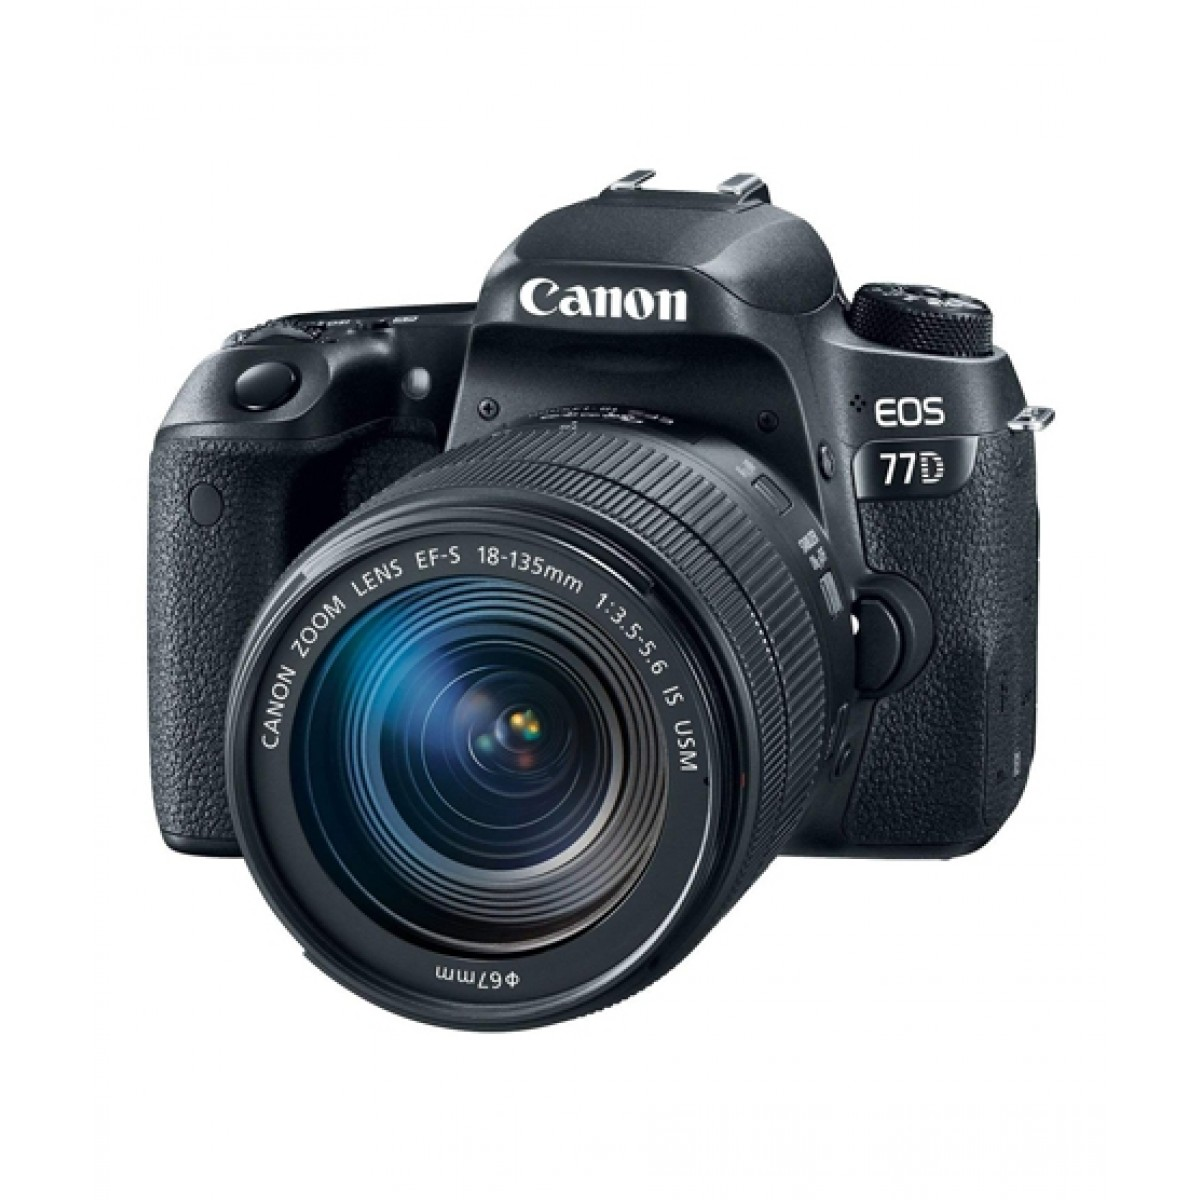 Canon EOS 77D DSLR Camera With 18-135mm STM Lens - MBM Warranty